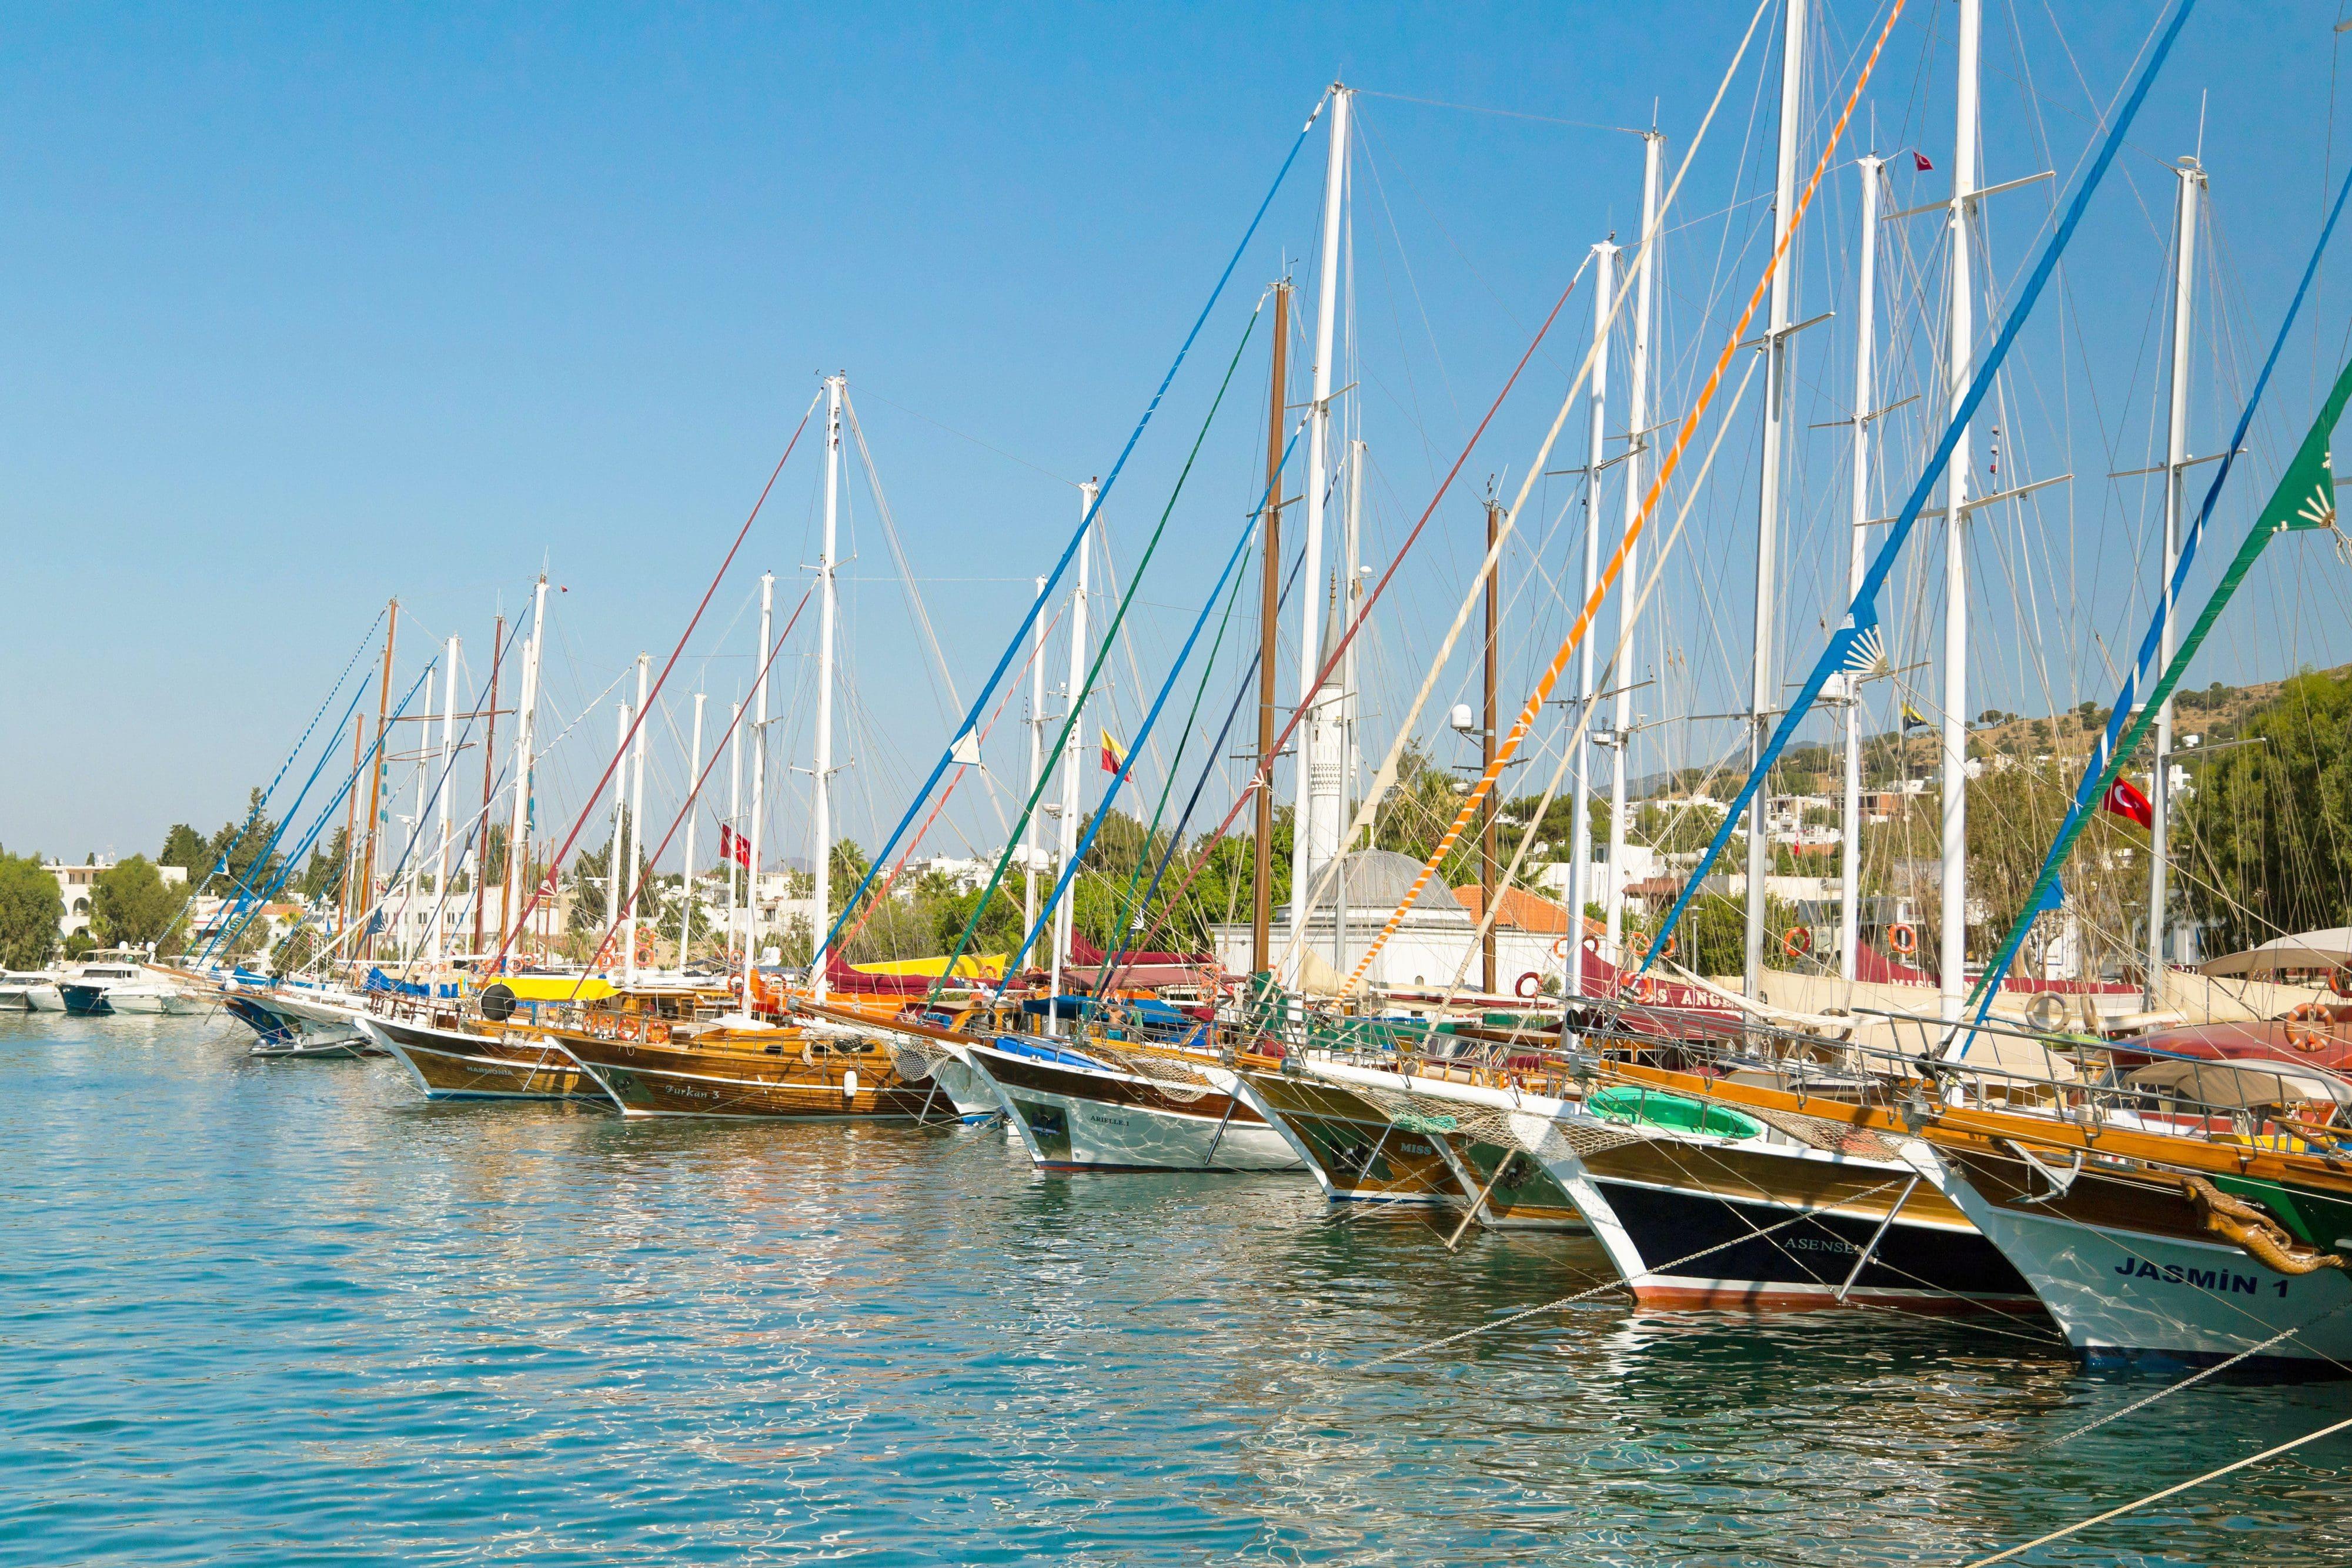 The mega yachts